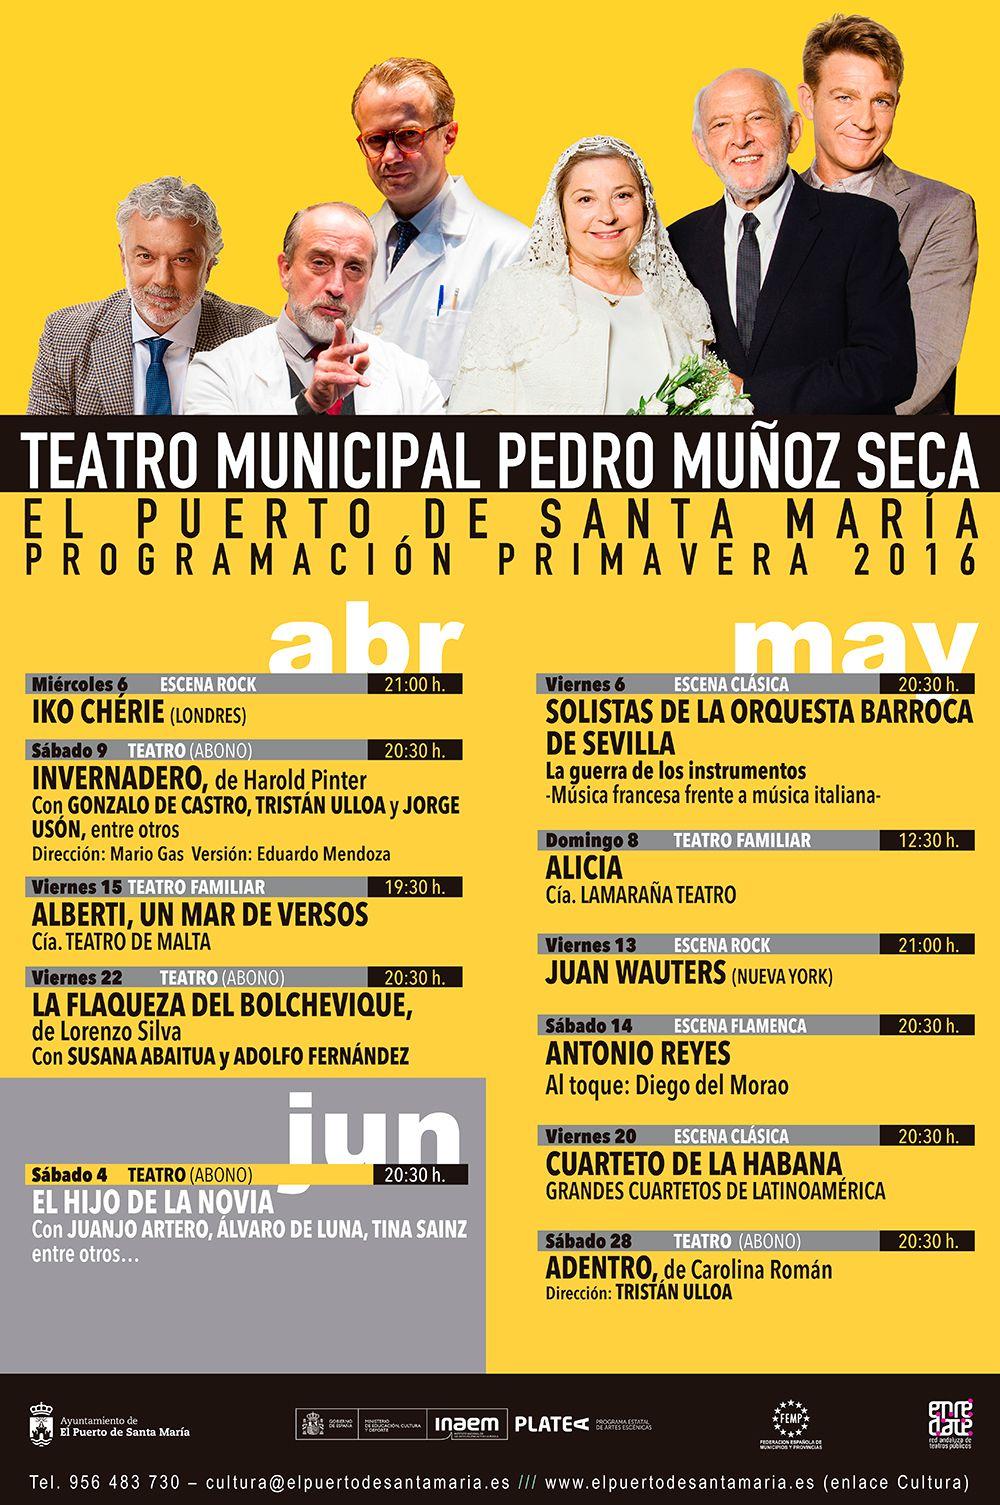 Temporada Primavera 2016 - Teatro Pedro Muñoz Seca